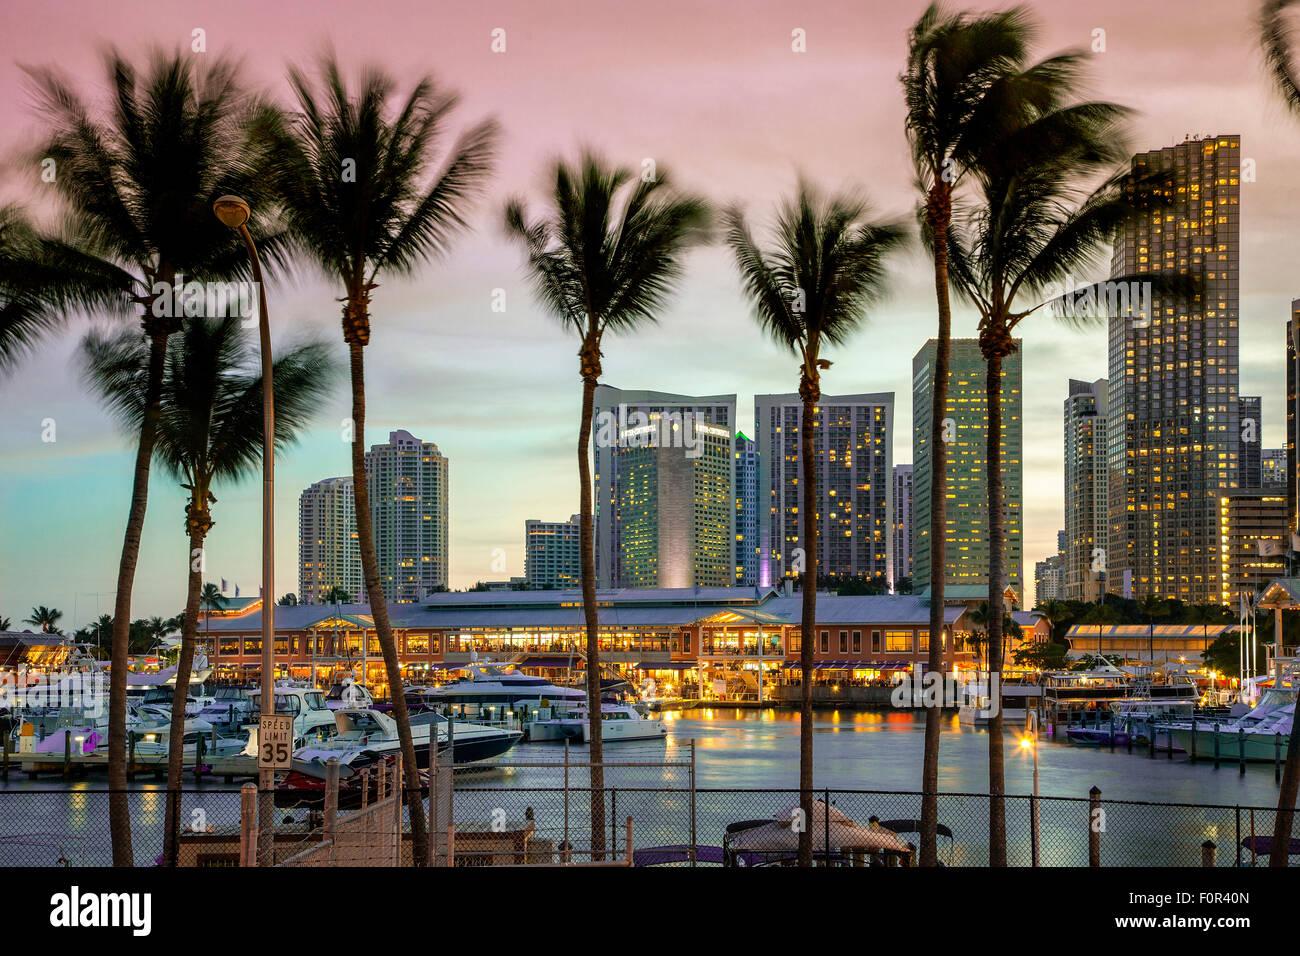 Miami, Bayside Mall at Dusk - Stock Image